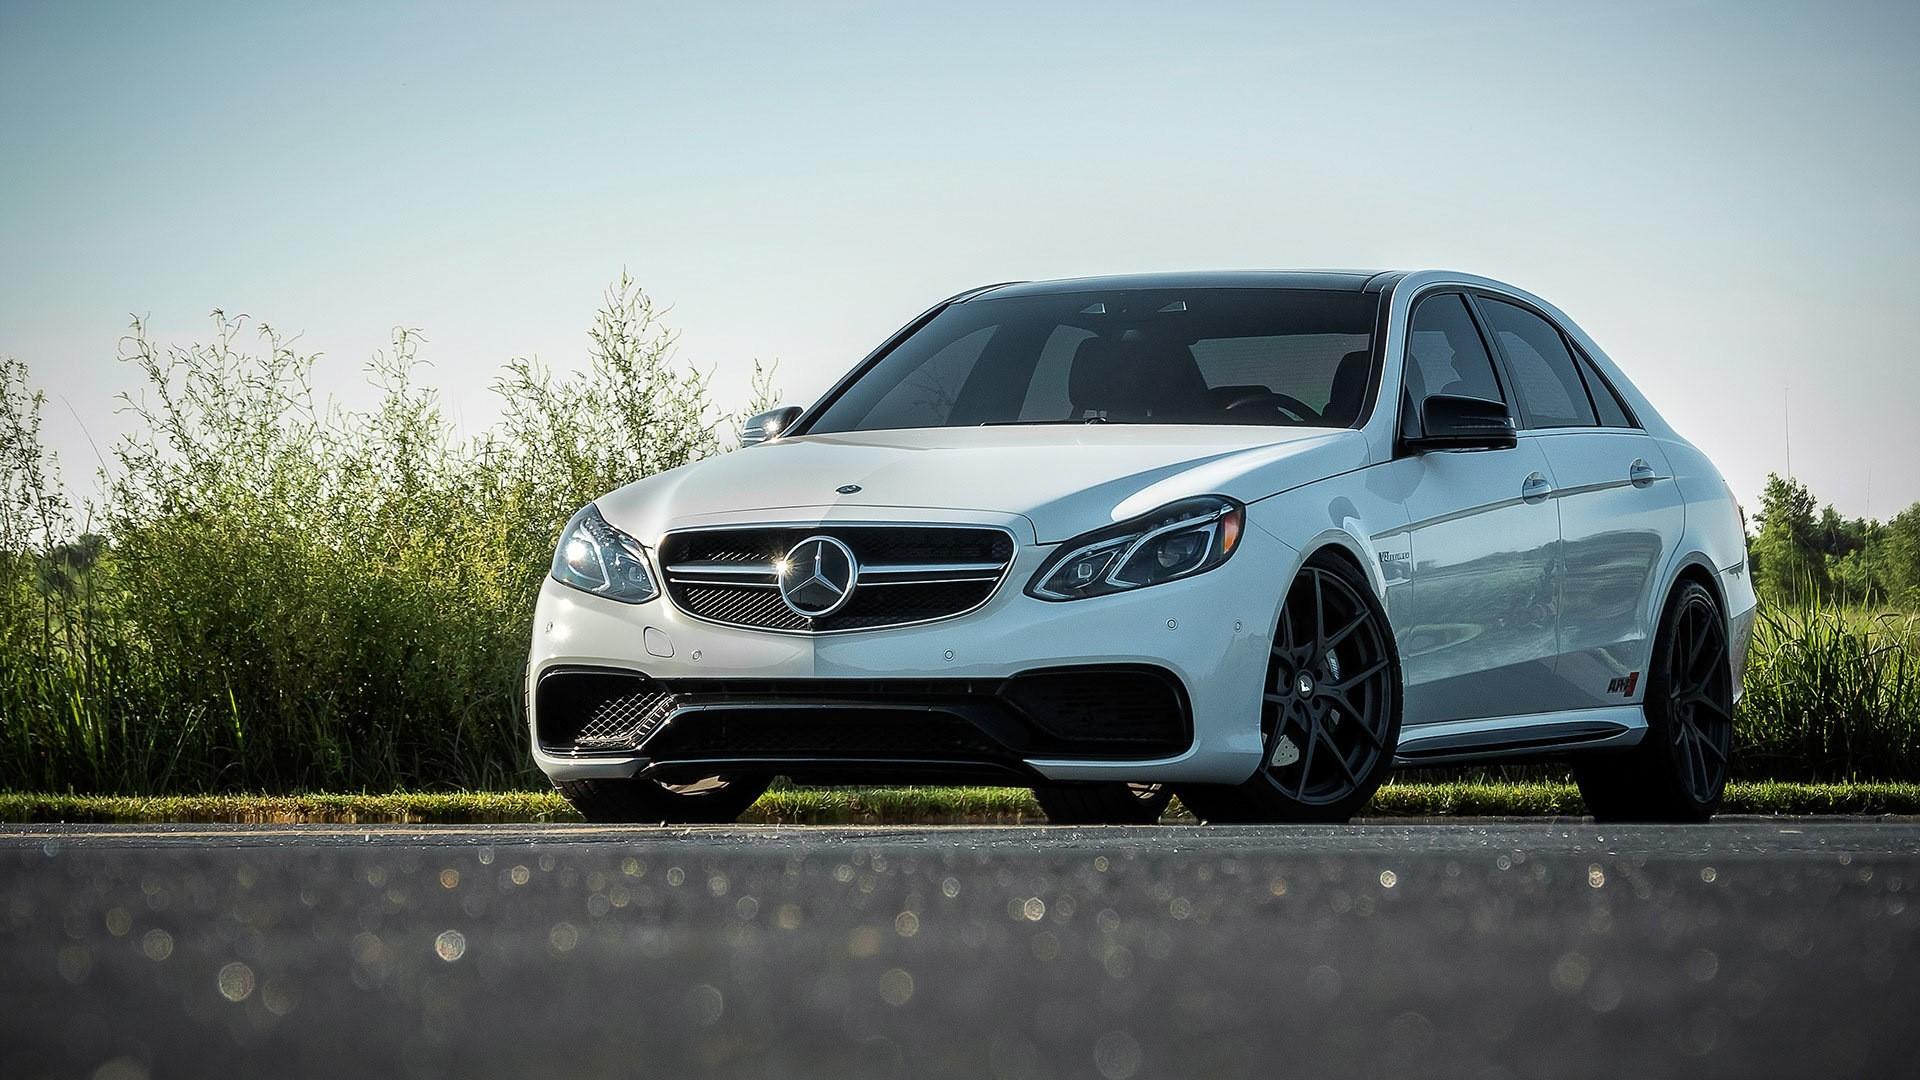 Mercedes Wallpaper Image